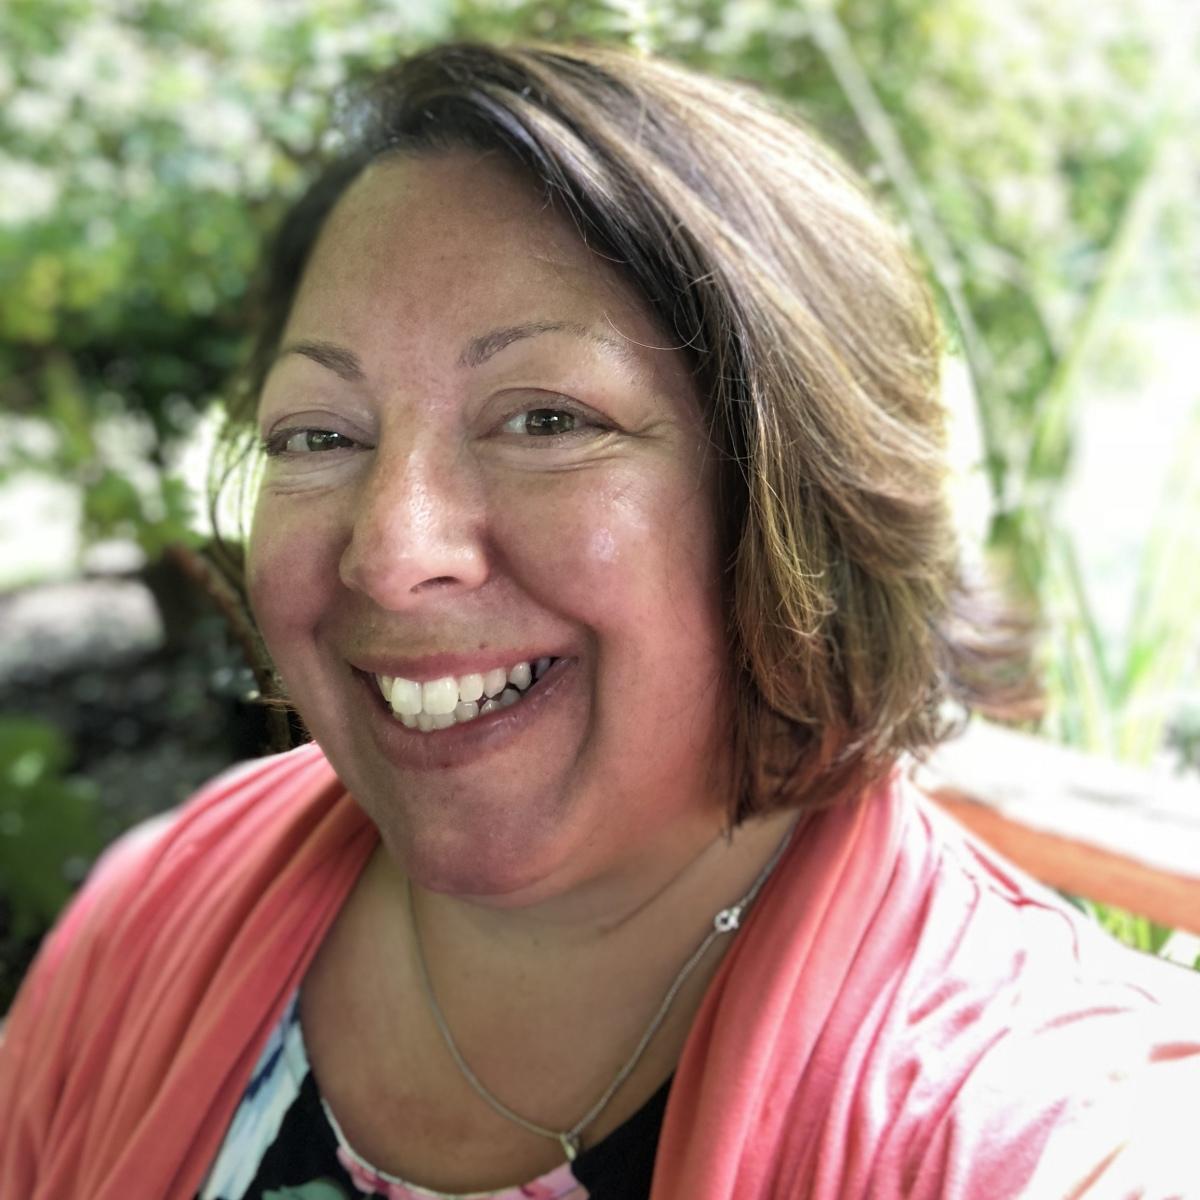 Julie Dennehy